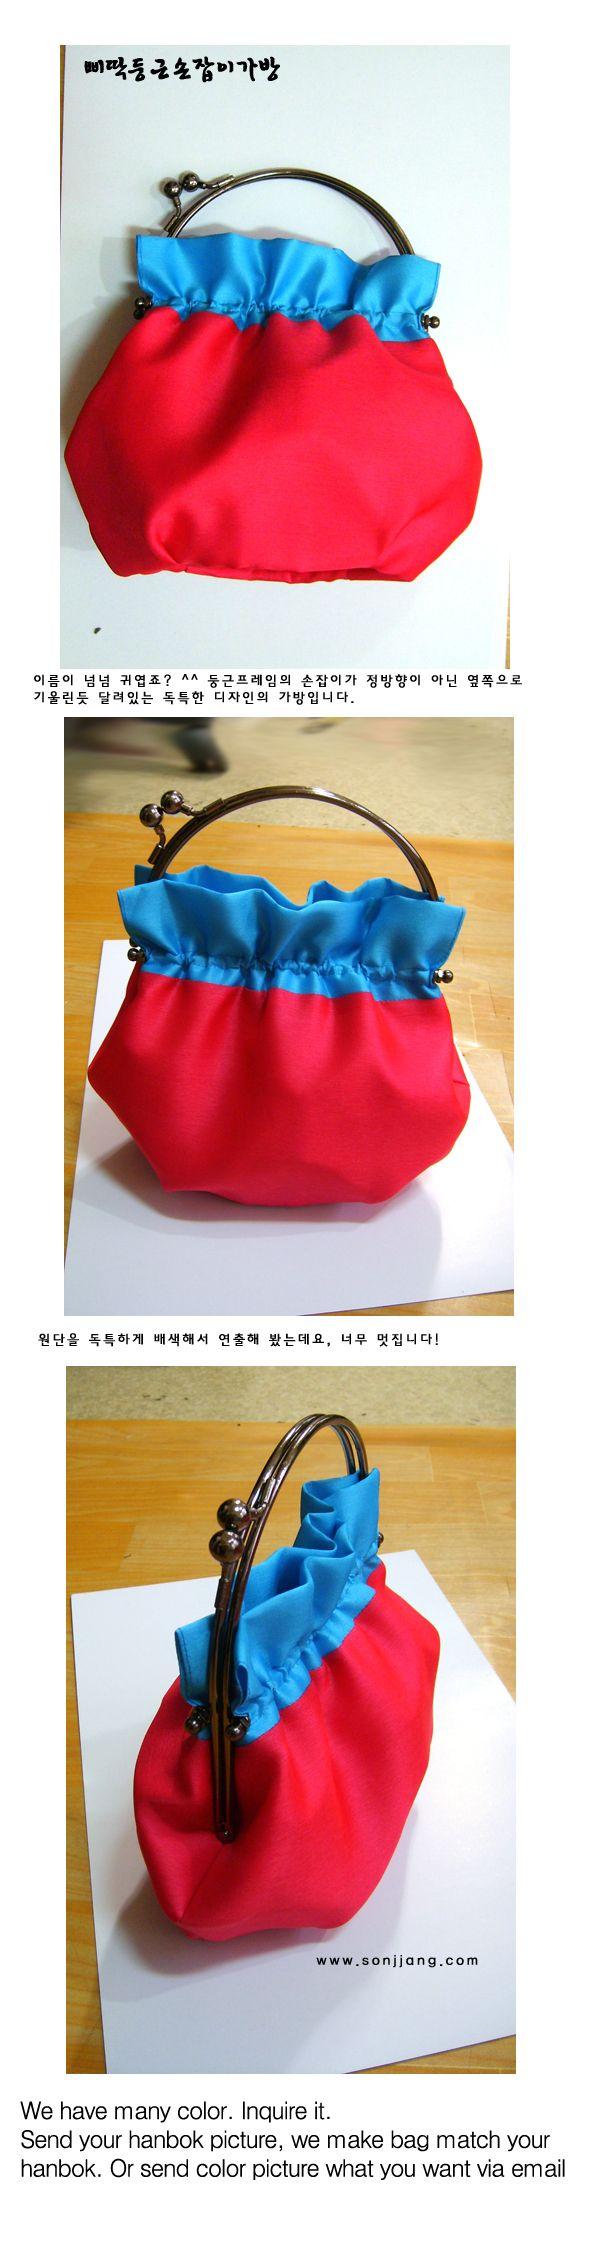 cute bag accessory <3